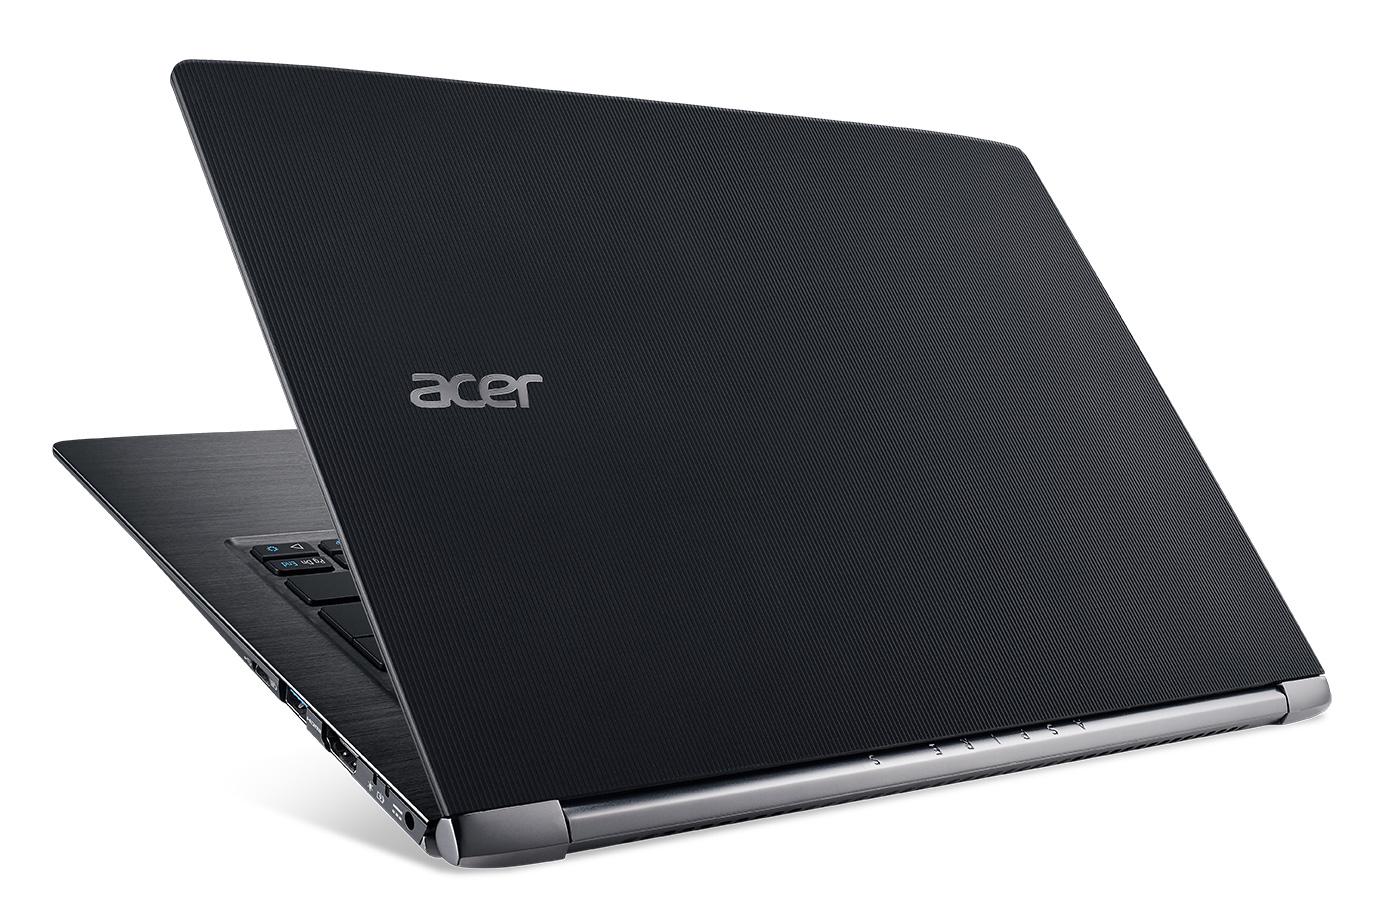 Acer Aspire S5-371-79SC, ultrabook 13 pouces SSD256 Full IPS i7 à 899€